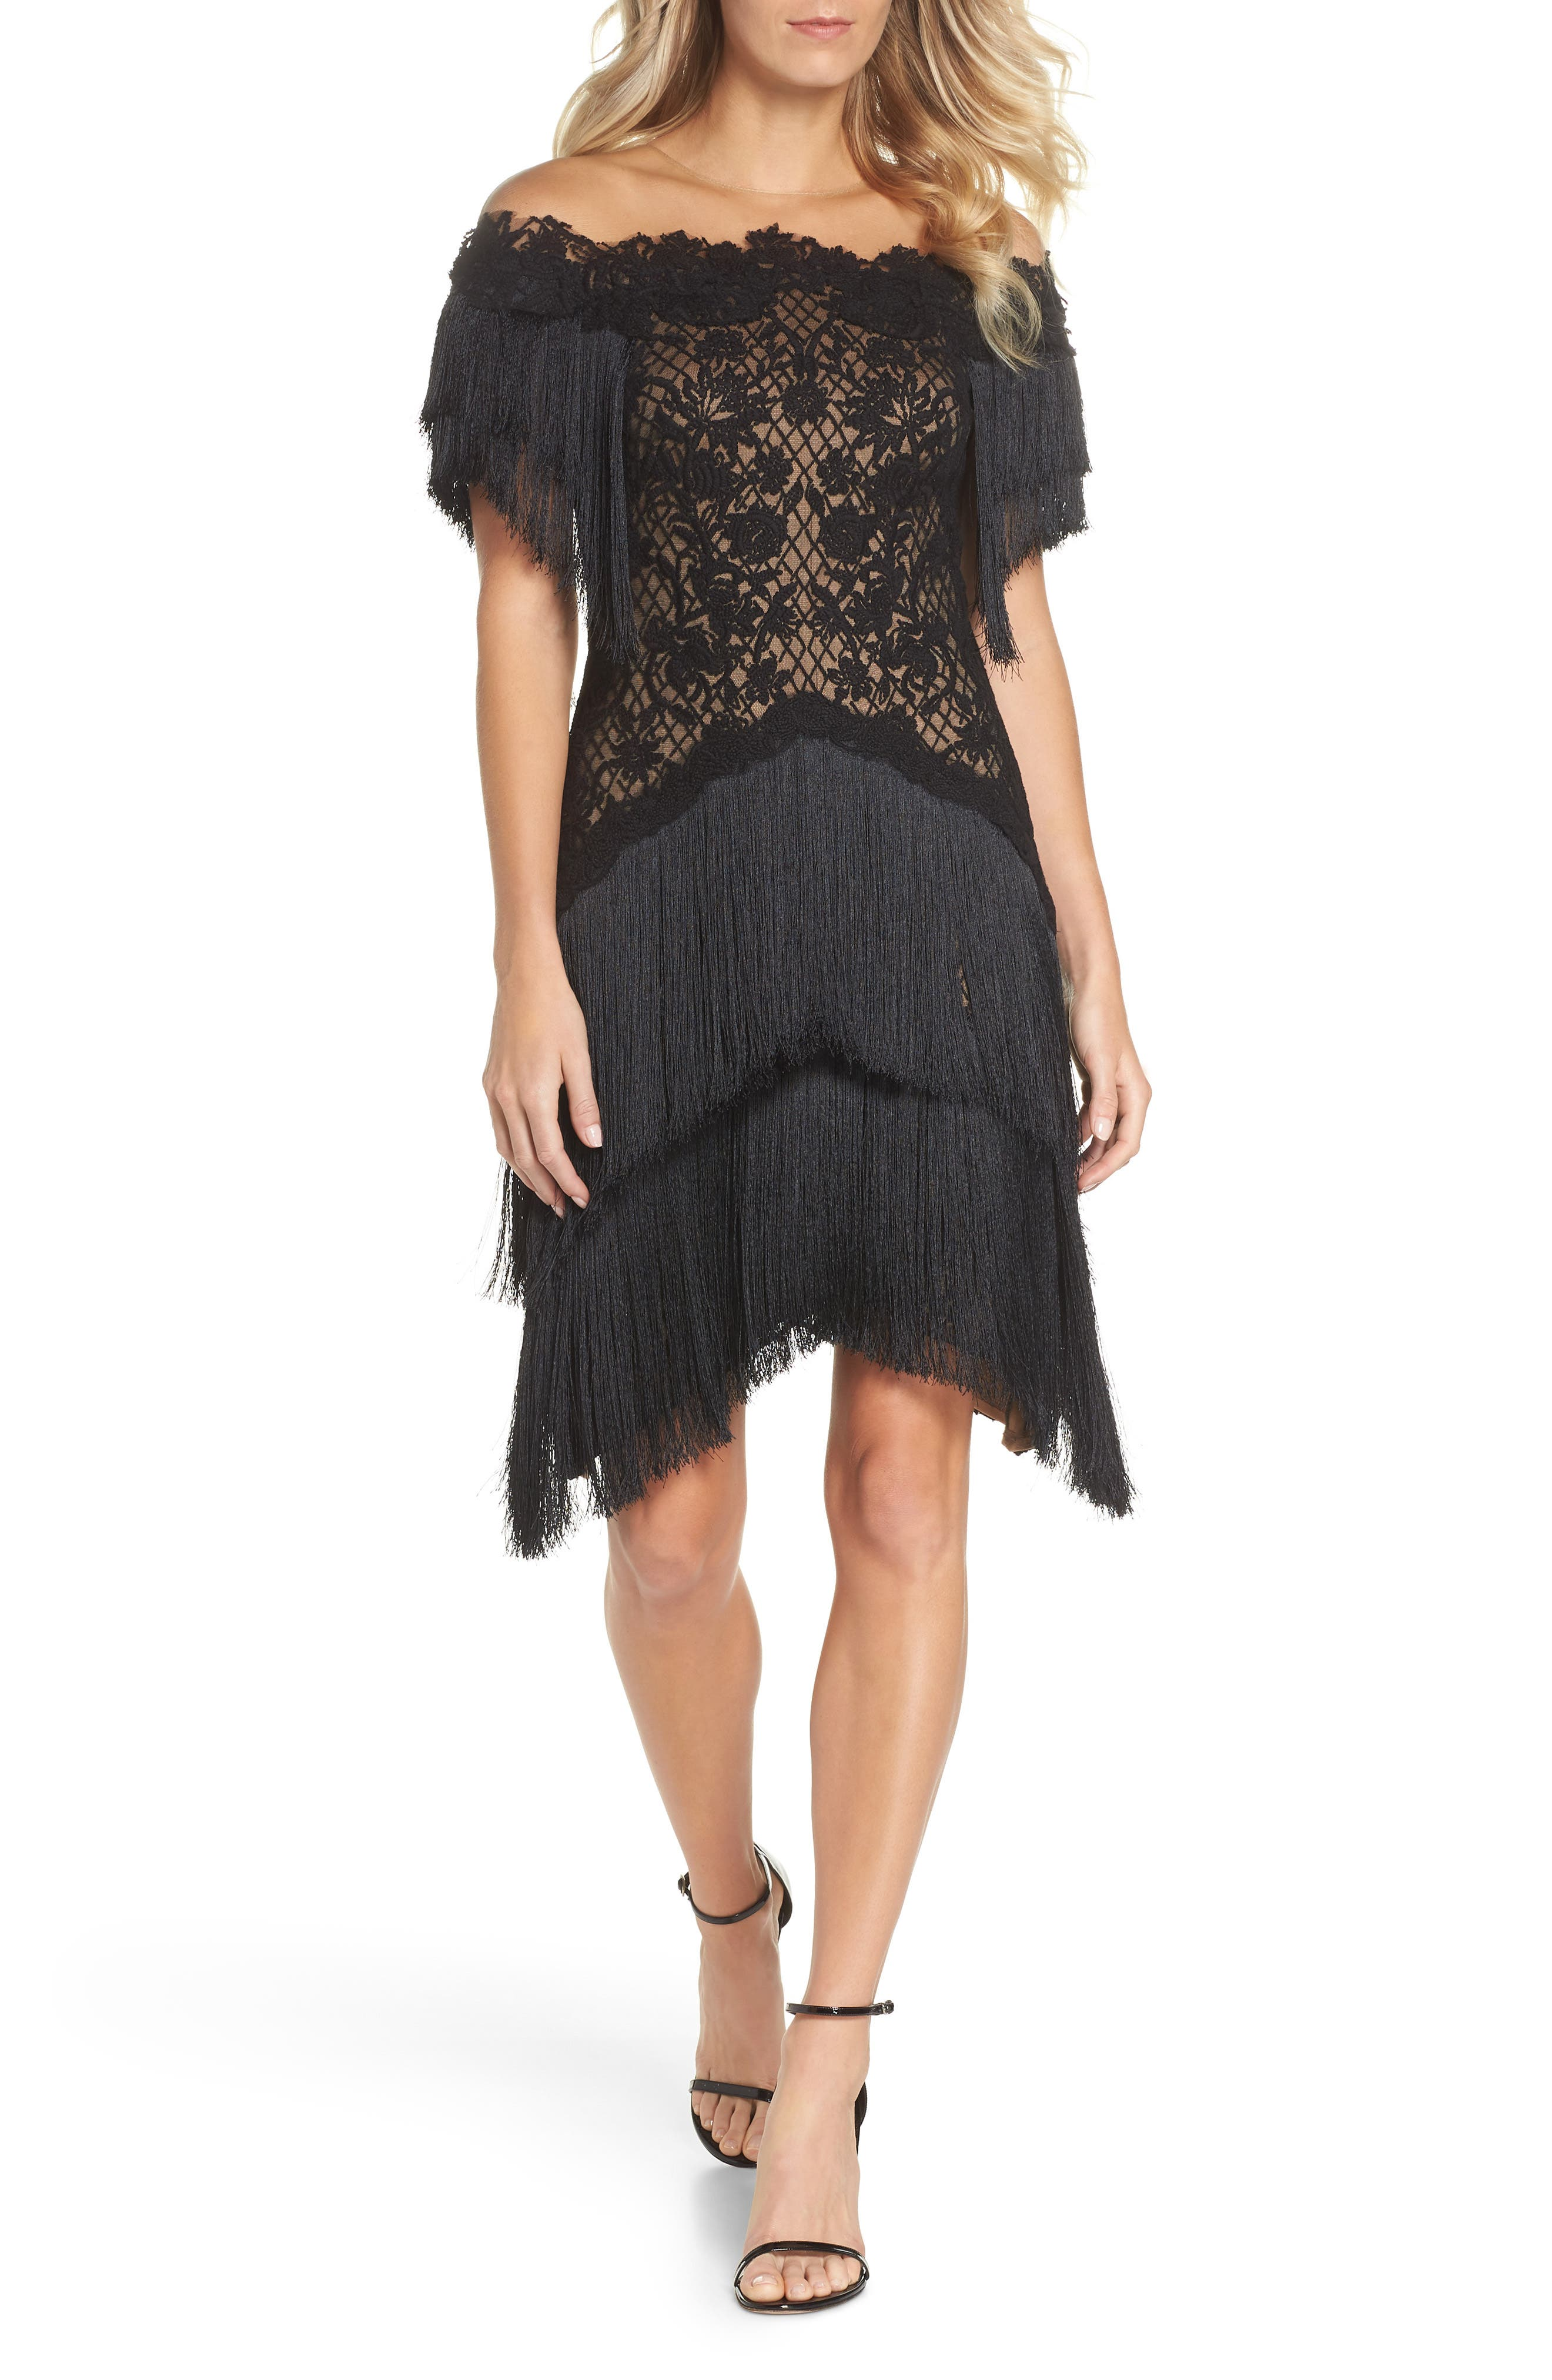 Off the Shoulder Fringe & Embroidered Mesh Dress,                             Main thumbnail 1, color,                             BLACK/ NUDE